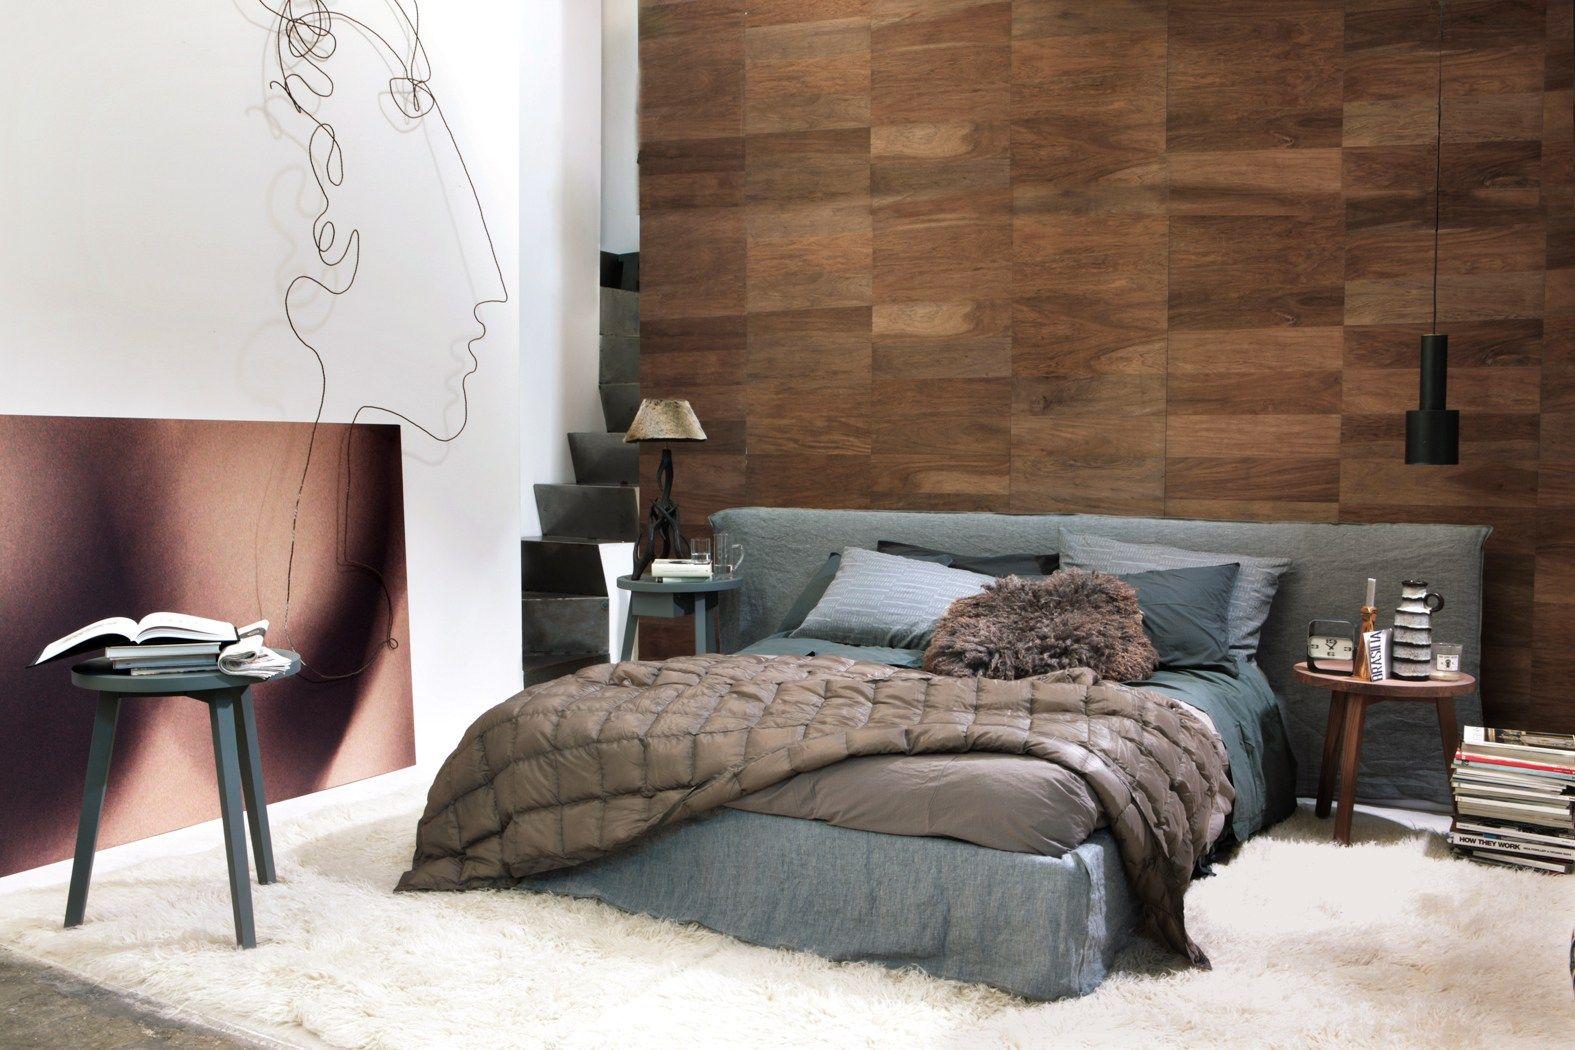 Modernes Sofa Design Kraftigen Farben Paola Navone